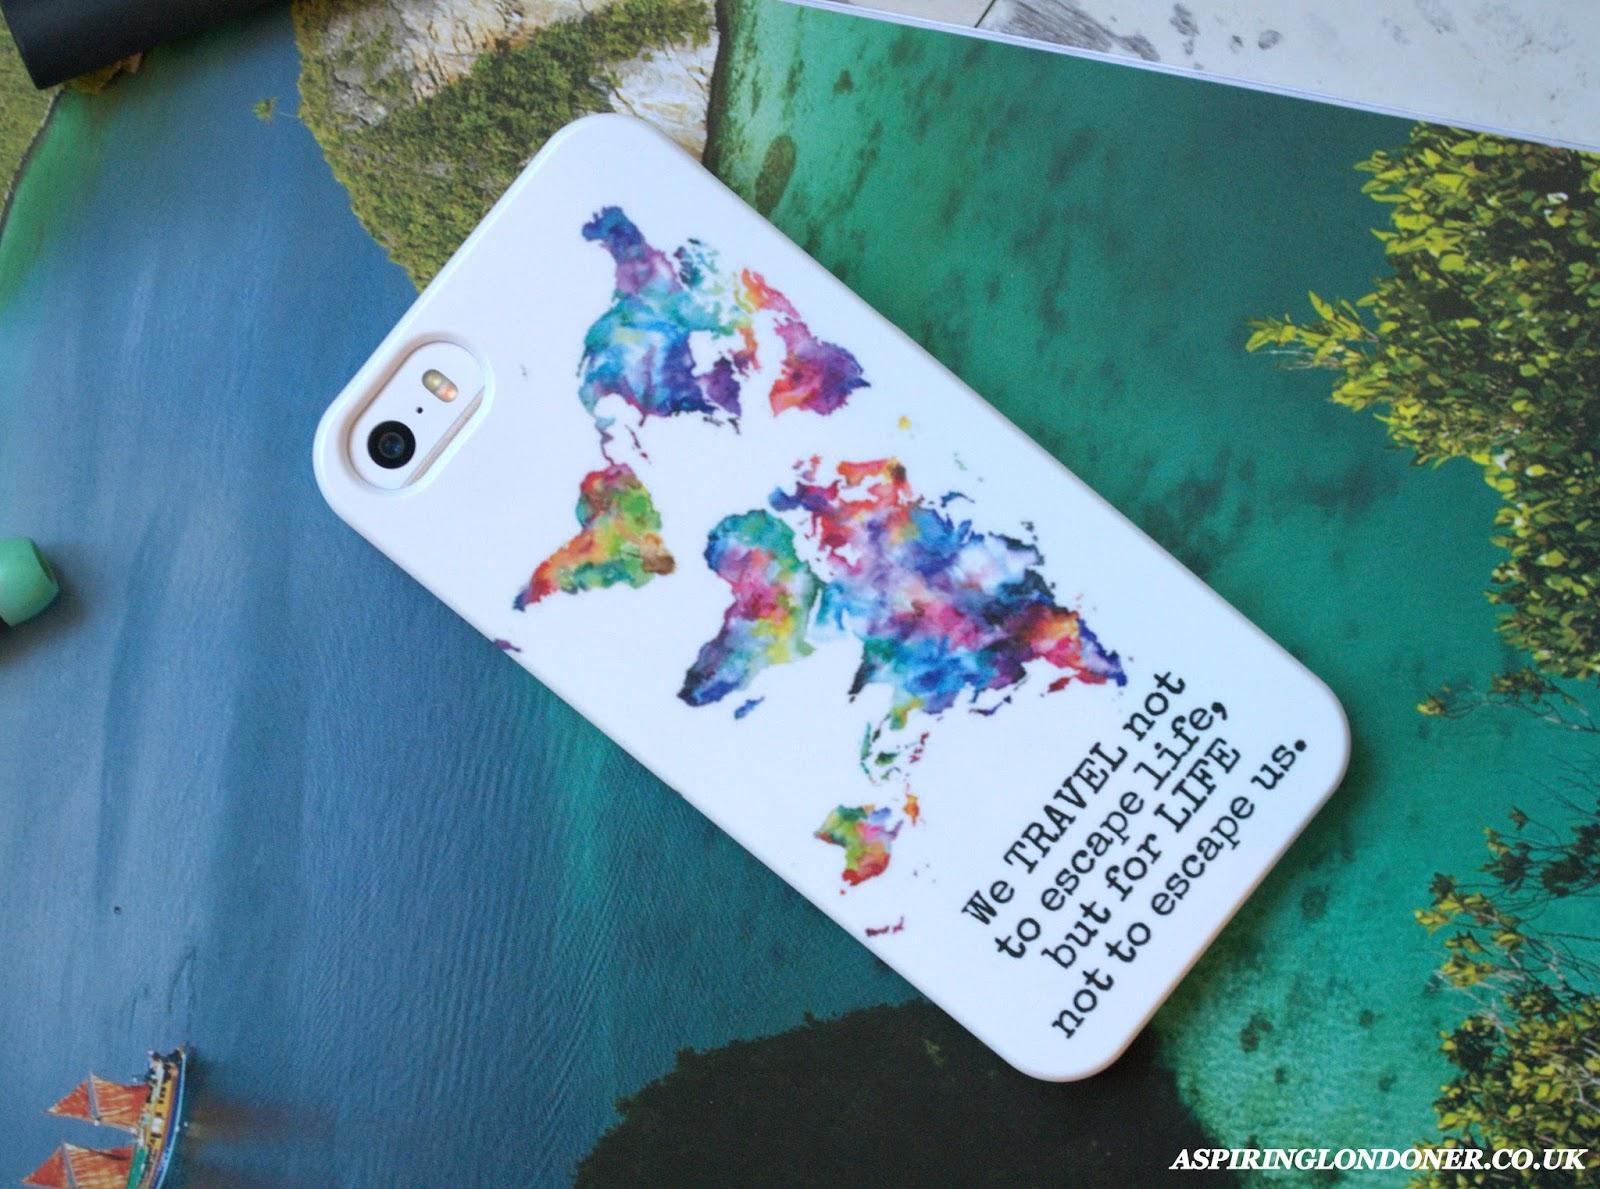 Caseapp iPhone 5S Case Review - Aspiring Londoner